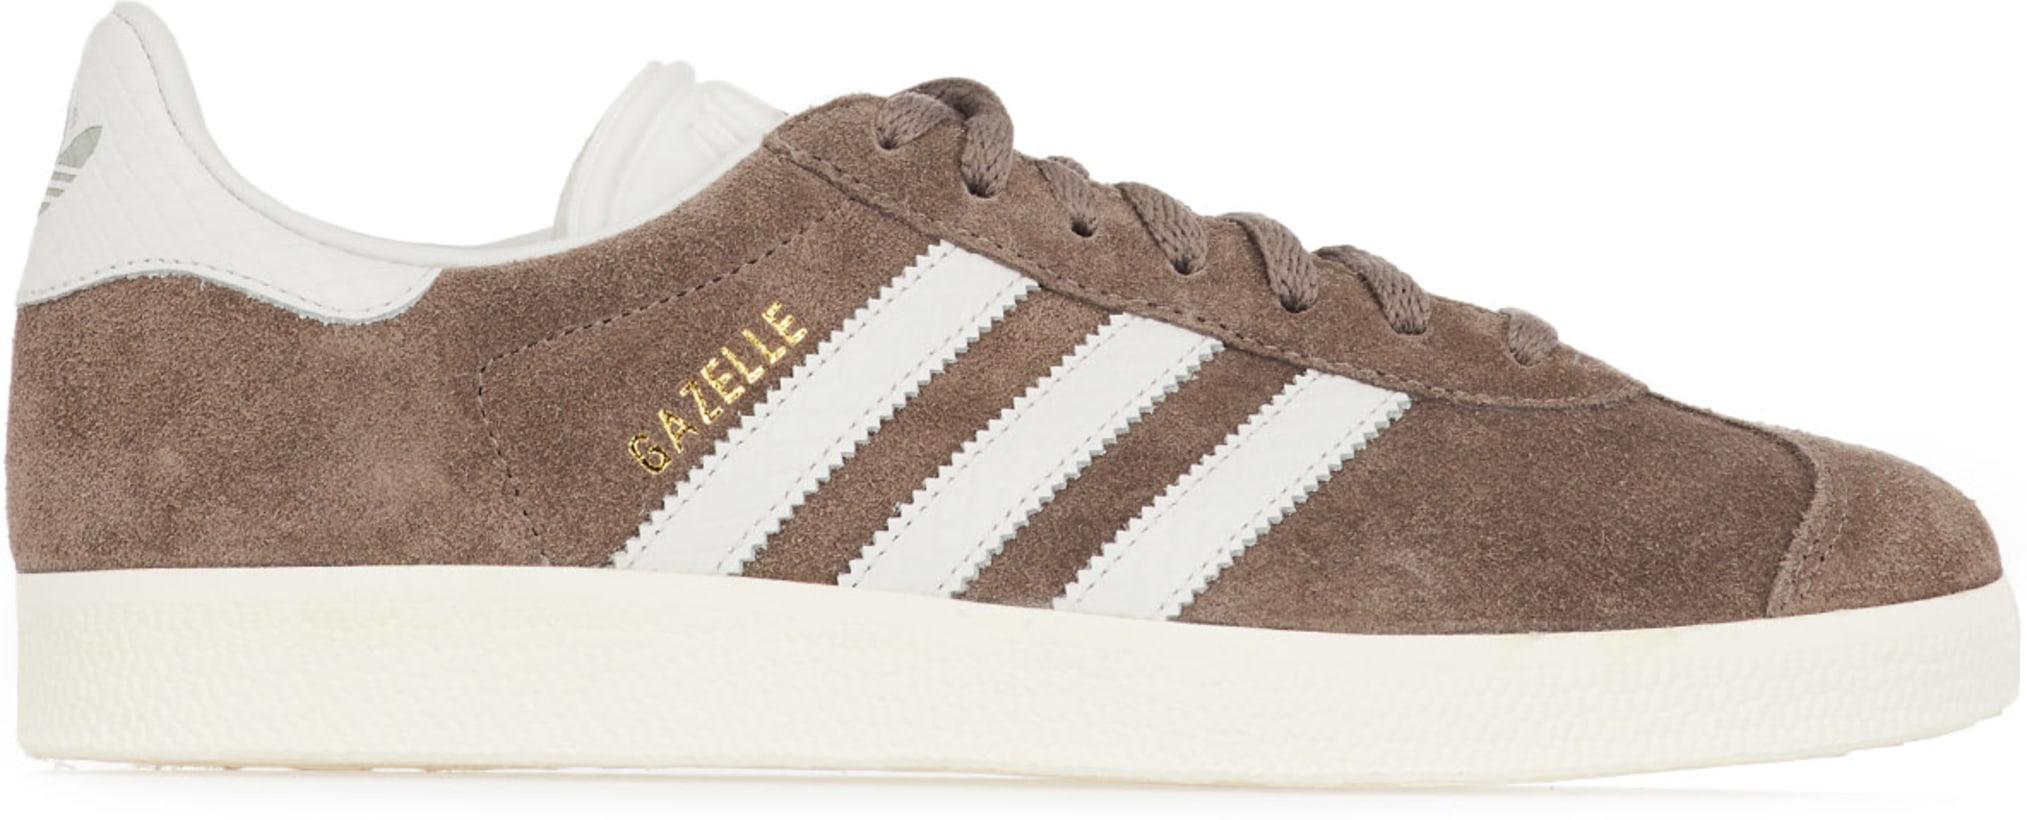 reputable site edd16 48923 adidas Originals. Gazelle - GreyVintage ...